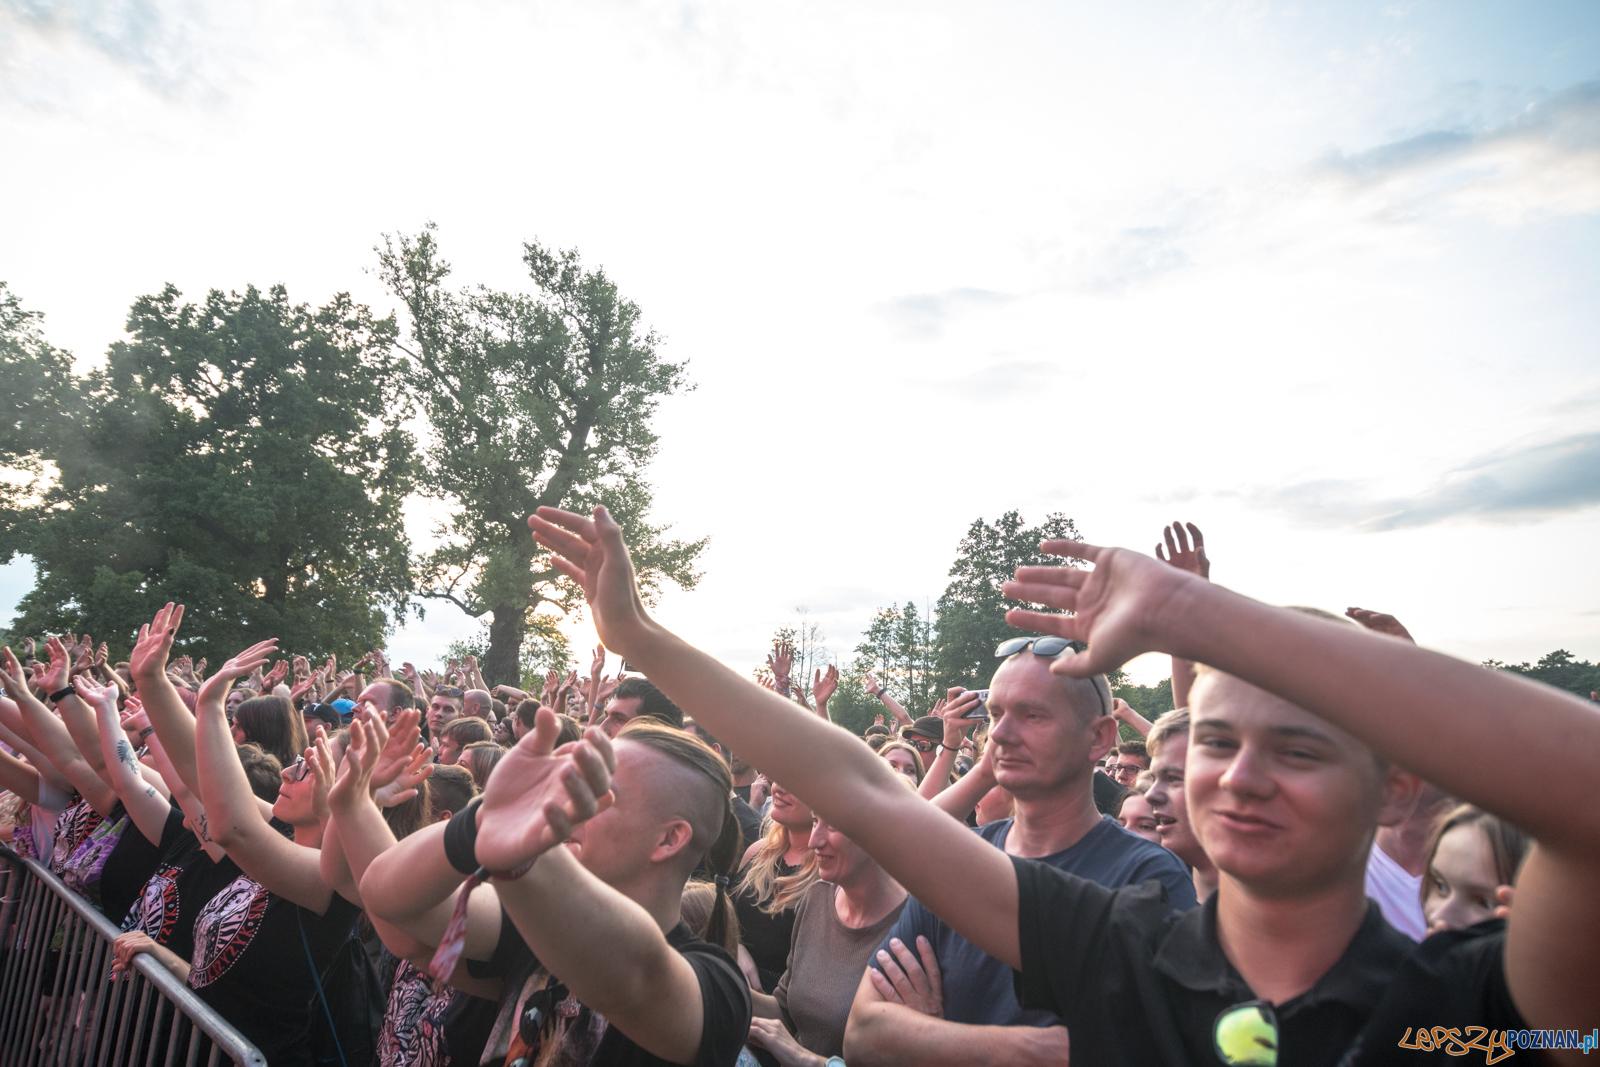 #NaFalach – Luxfest